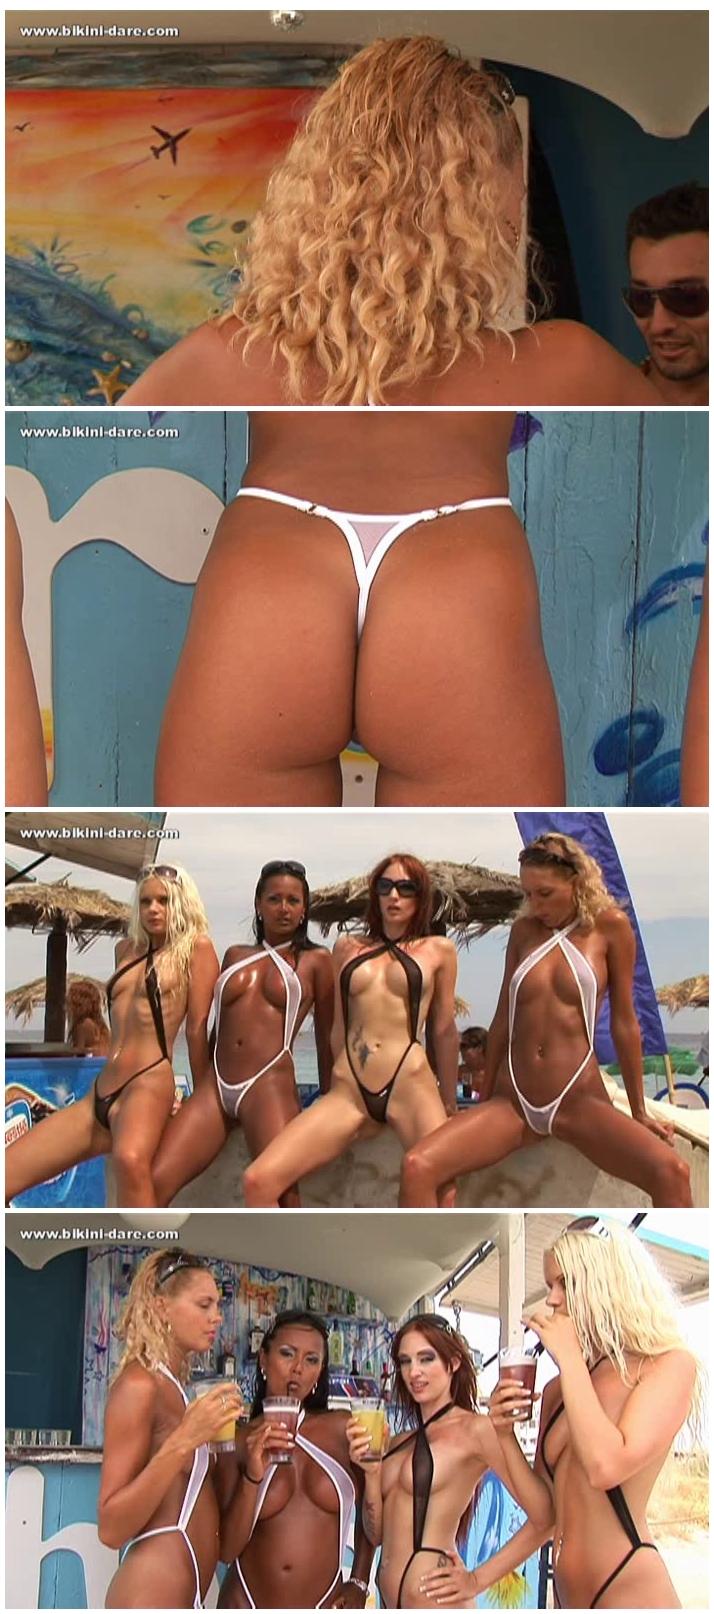 bikini-dare052_cover.jpg